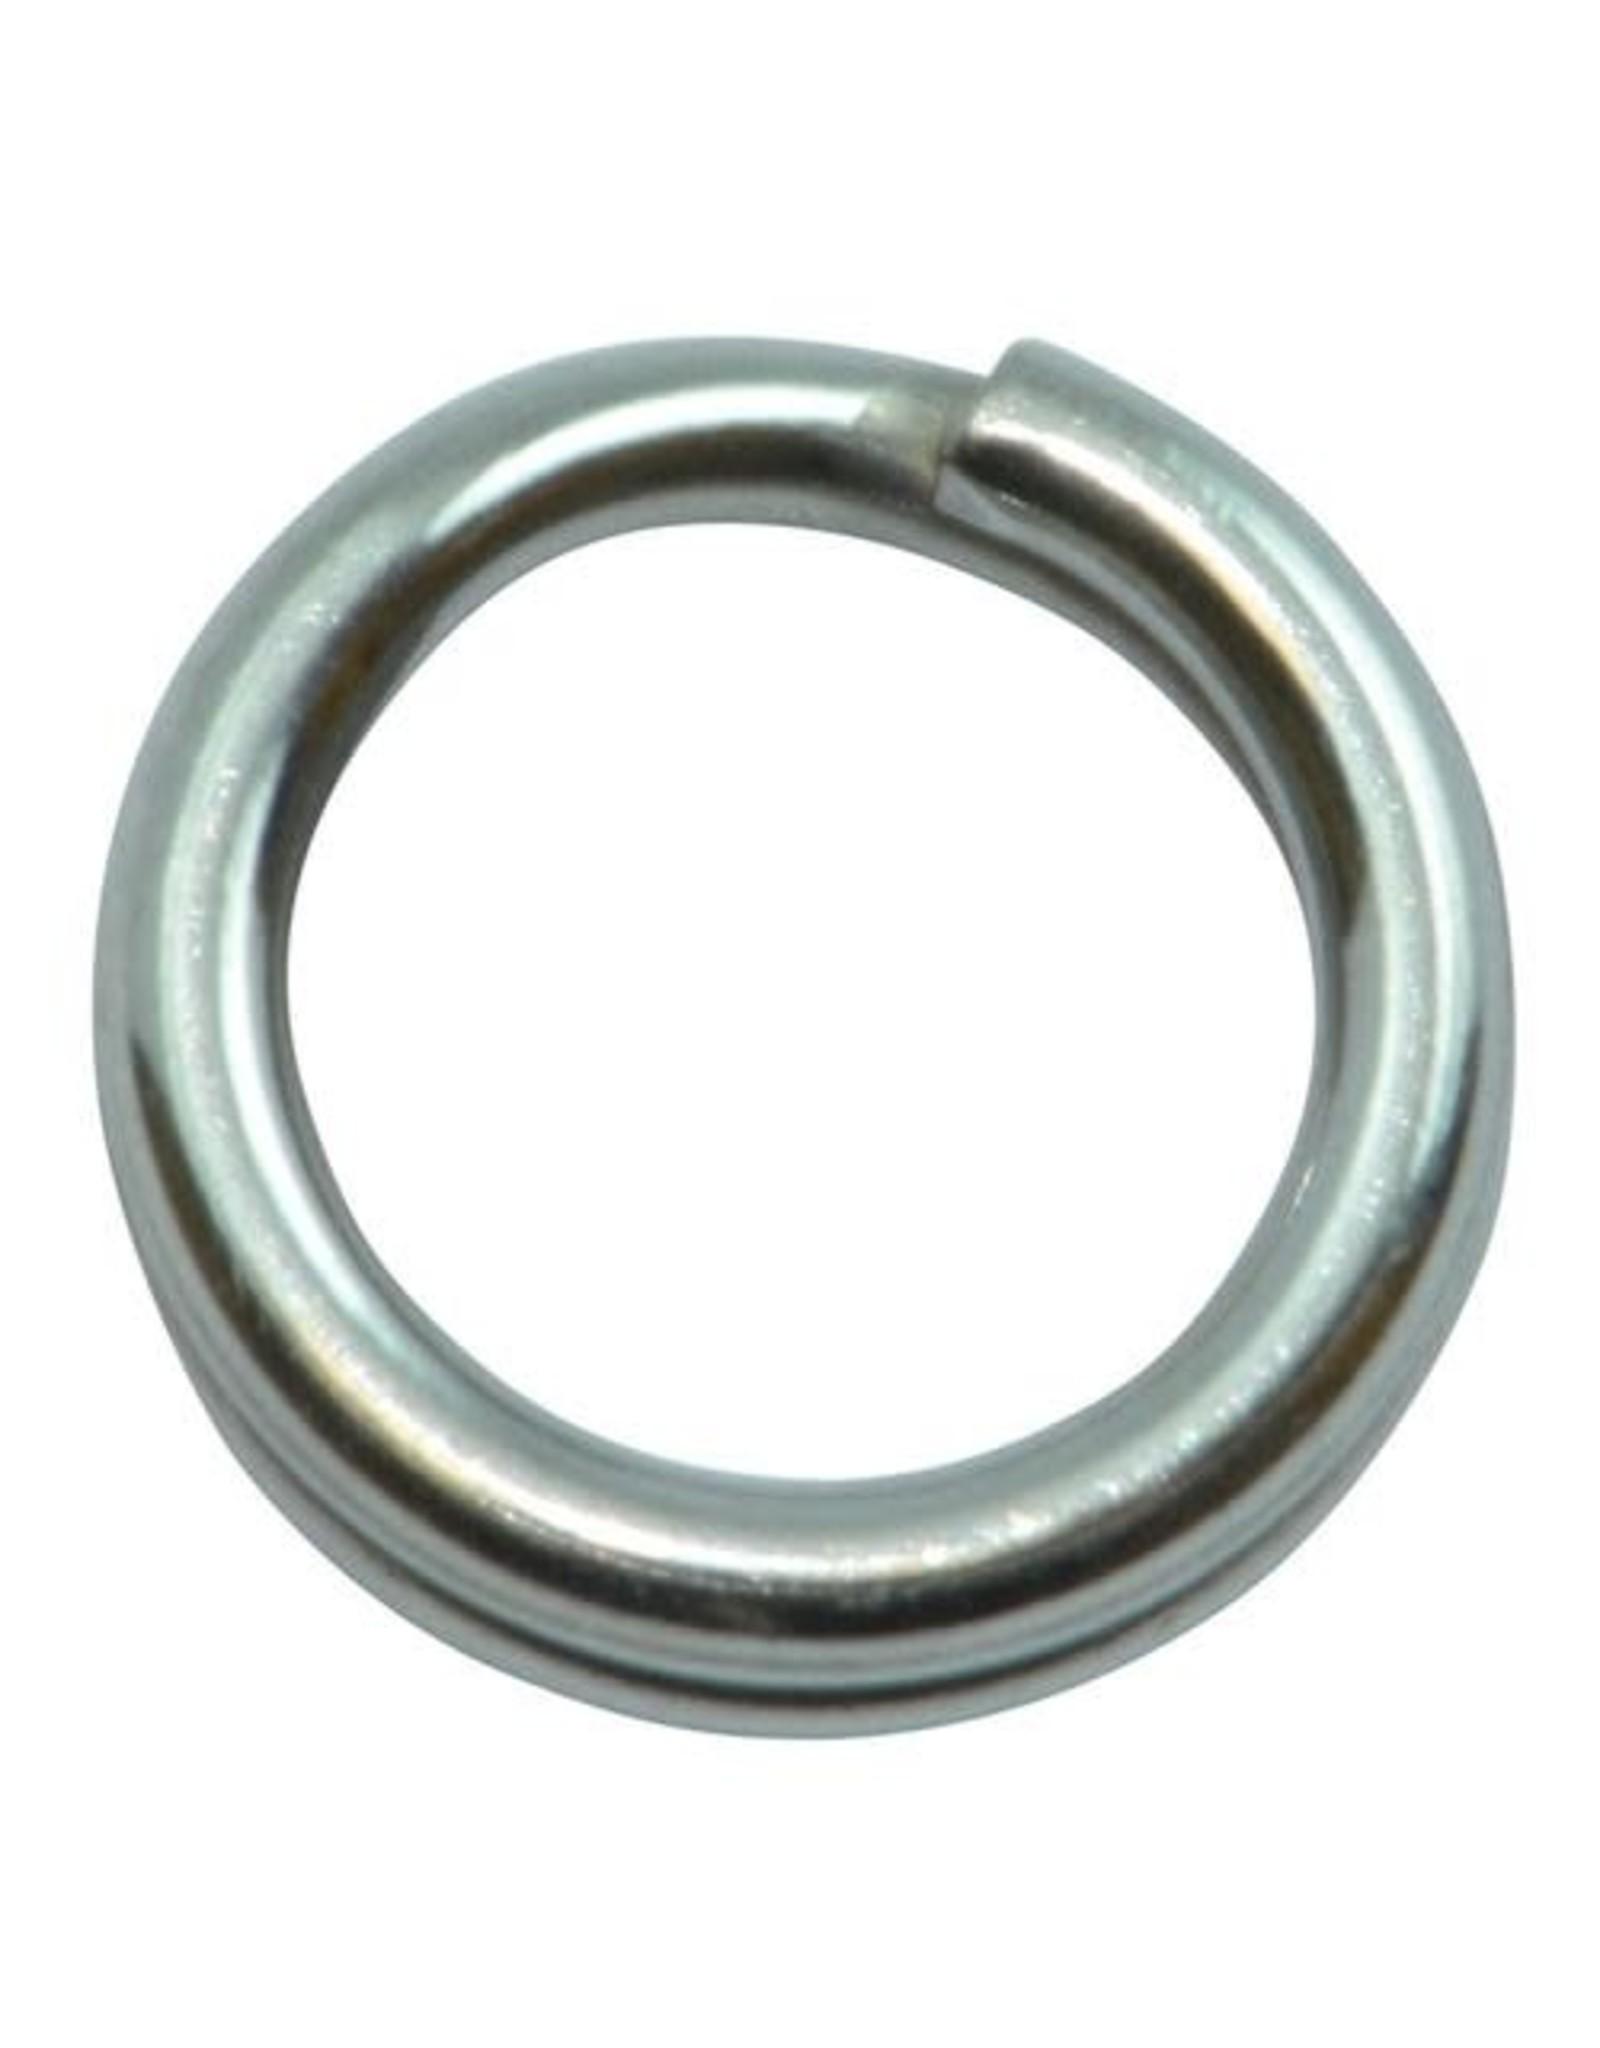 Spro Spro Power Split Ring Stainless Steel